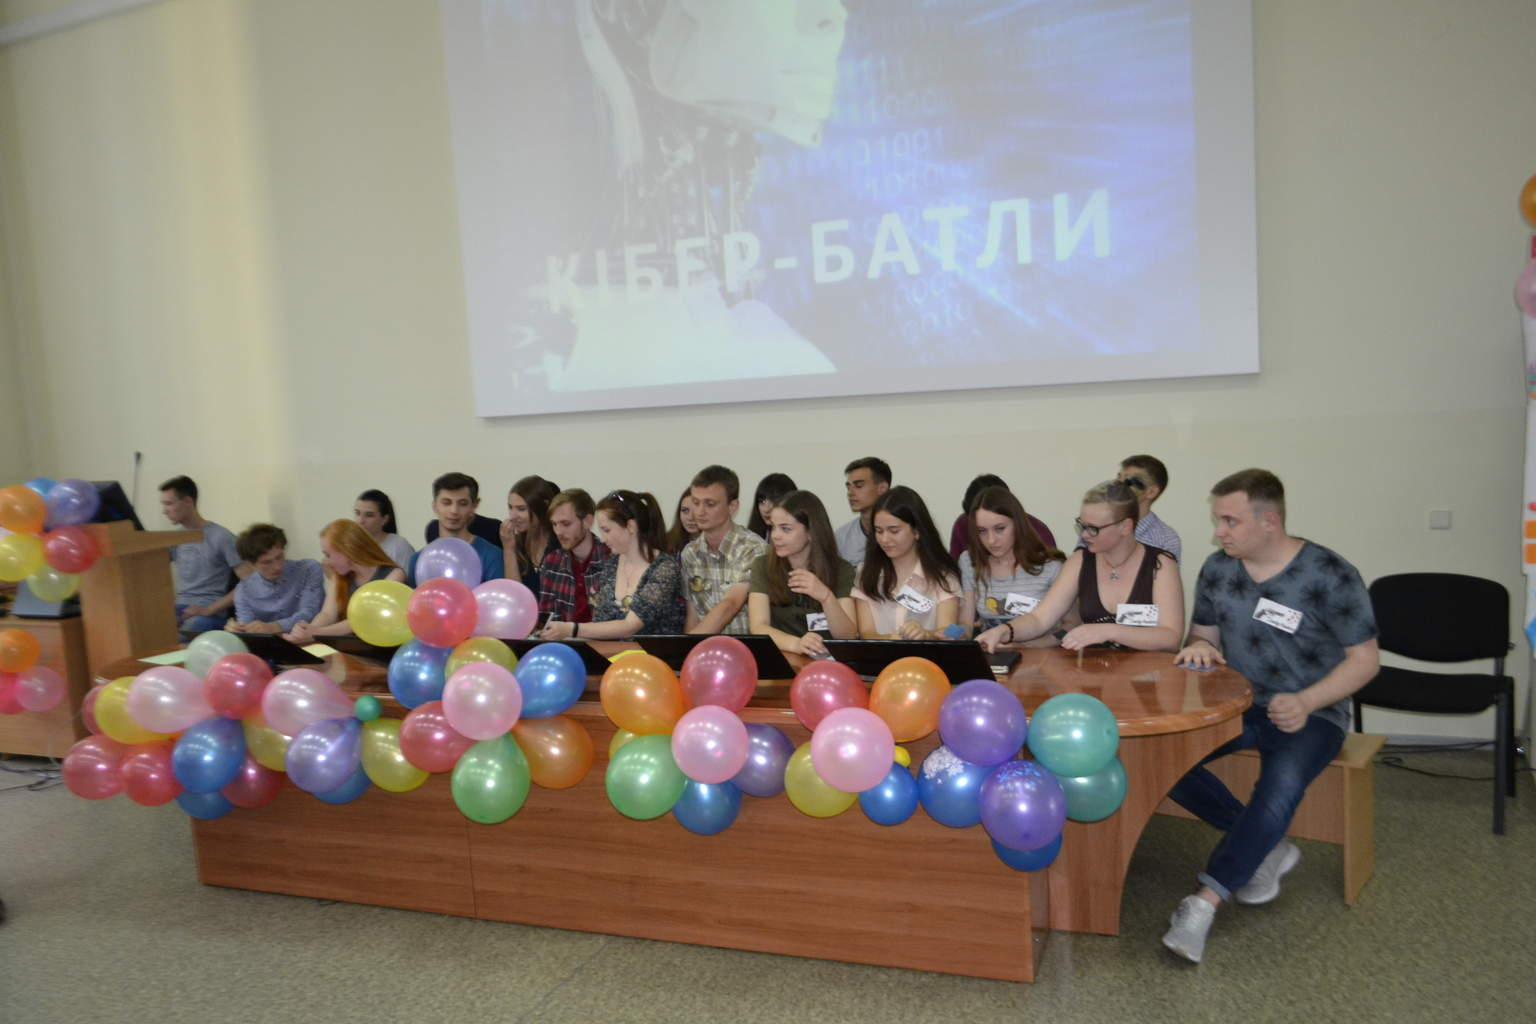 інтелектуальні змагання «Кібер-батли»